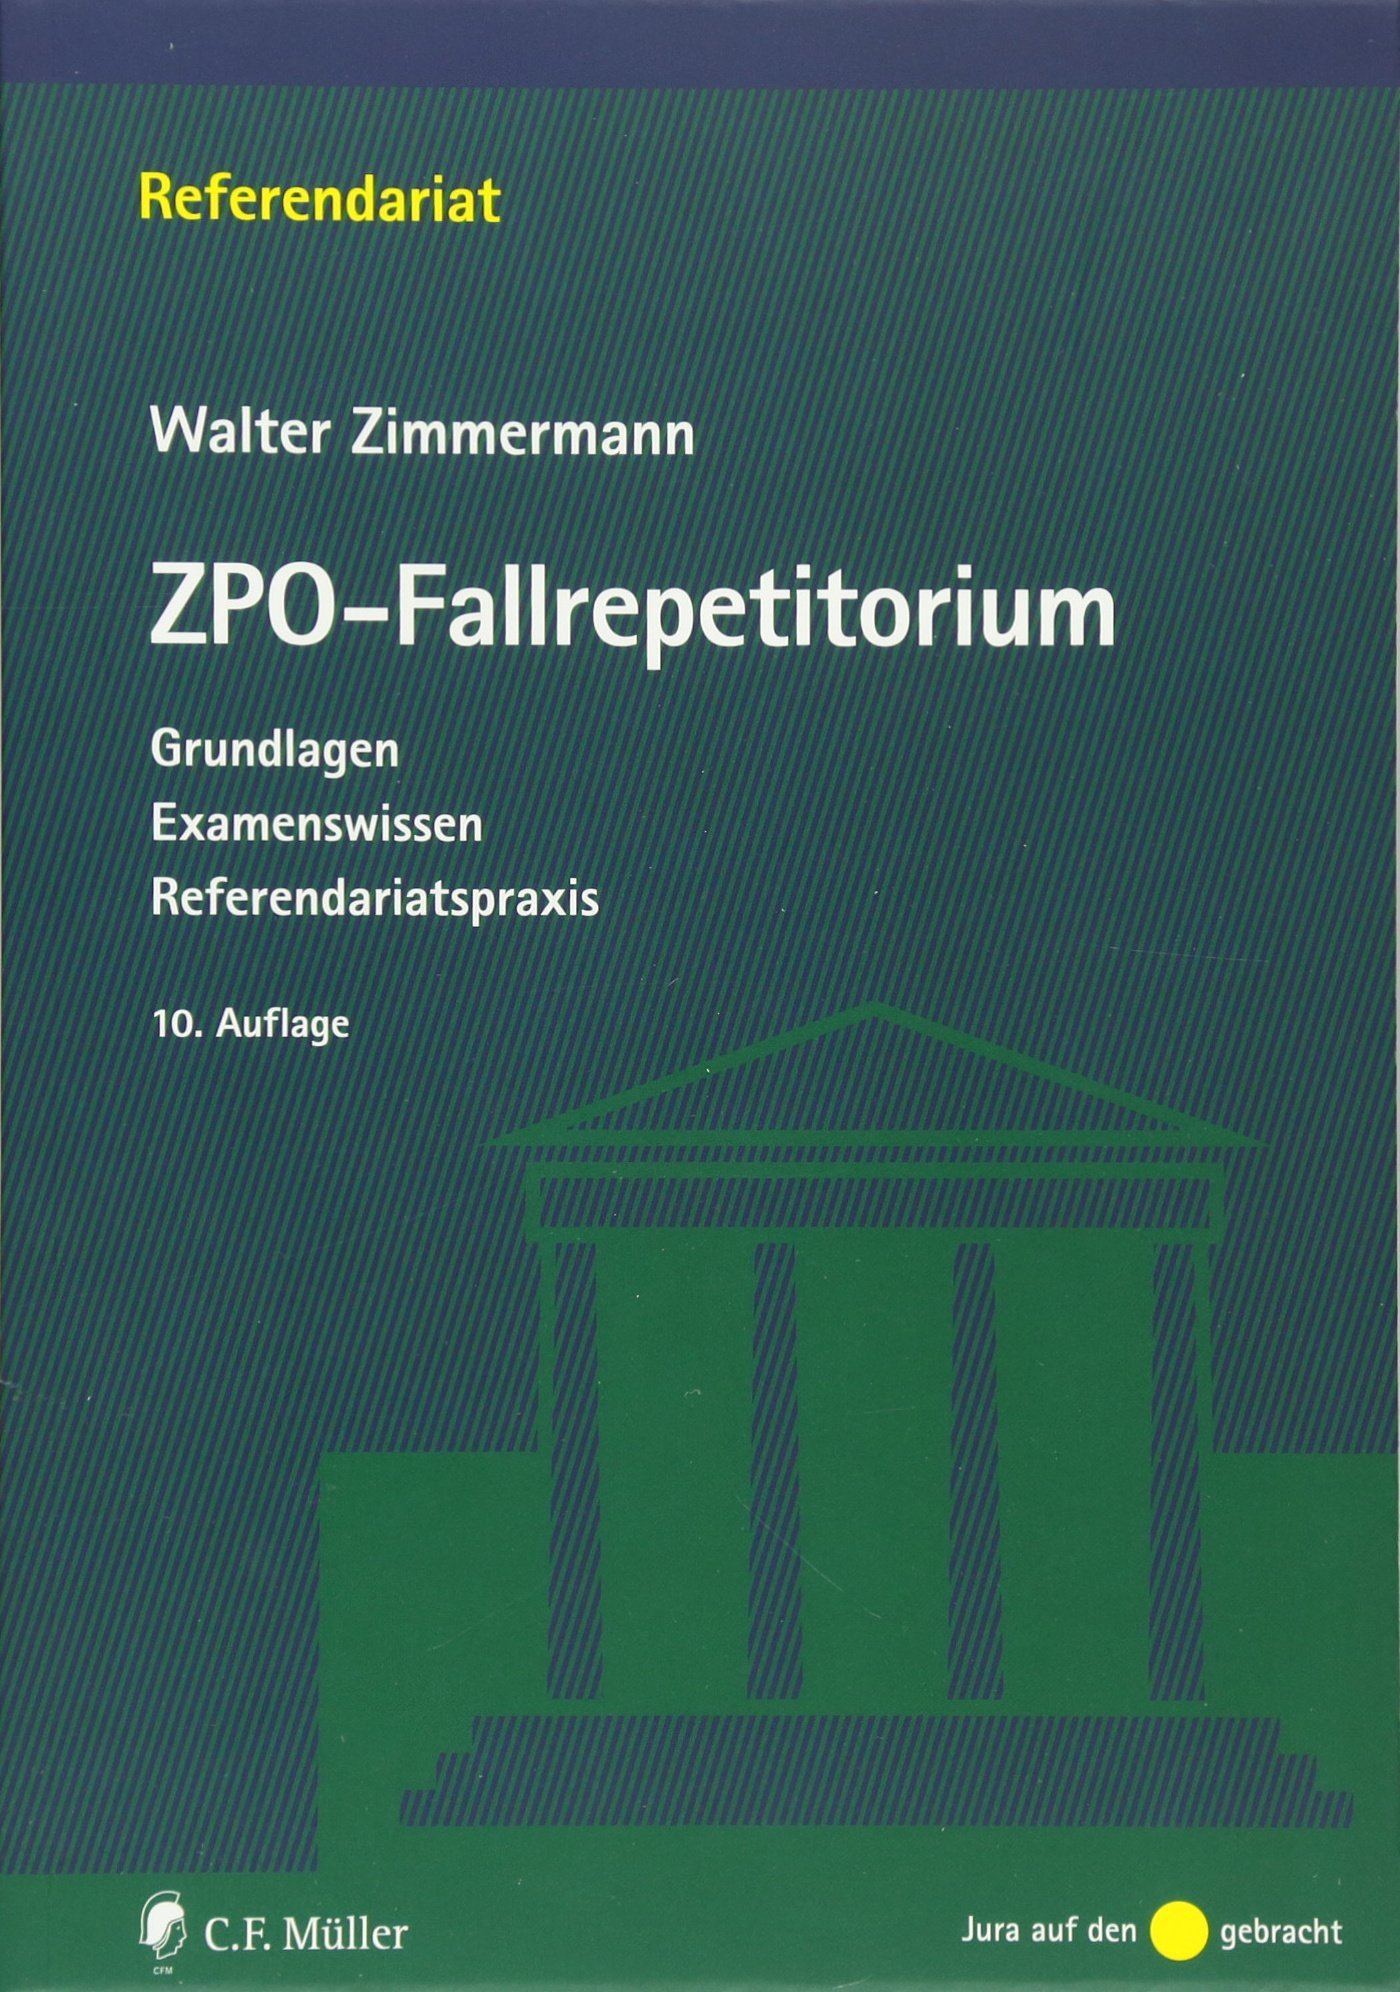 ZPO-Fallrepetitorium: Grundlagen - Examenswissen ...